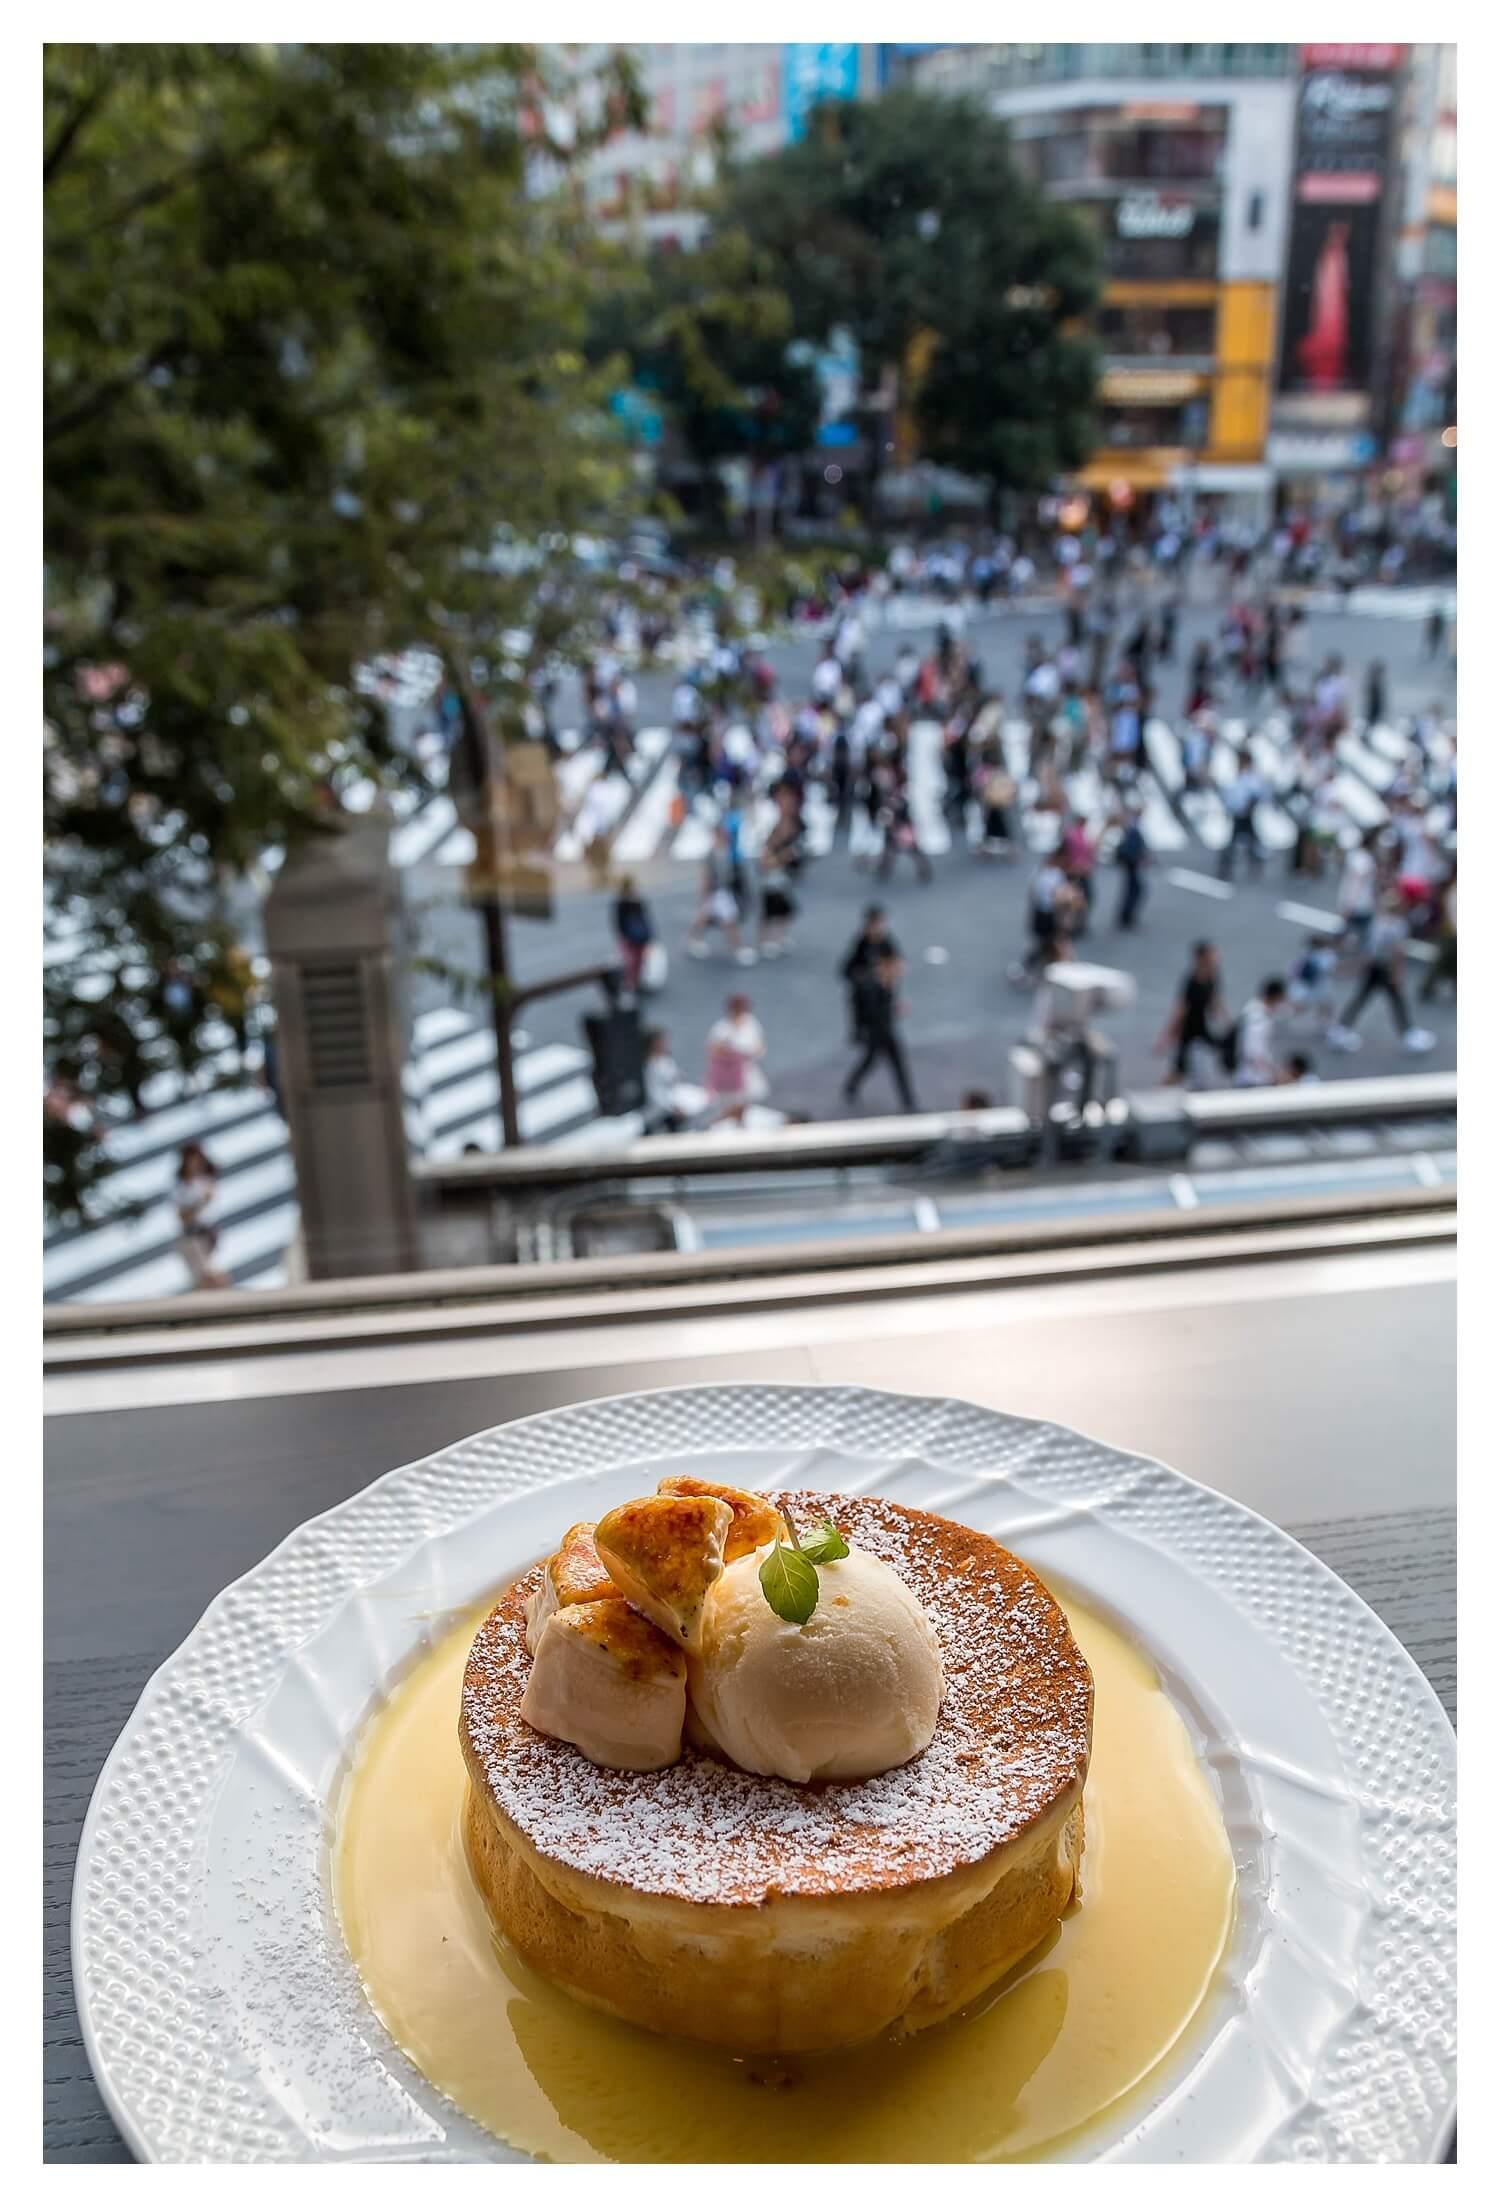 Things To Do In Tokyo, Japan - Shibuya